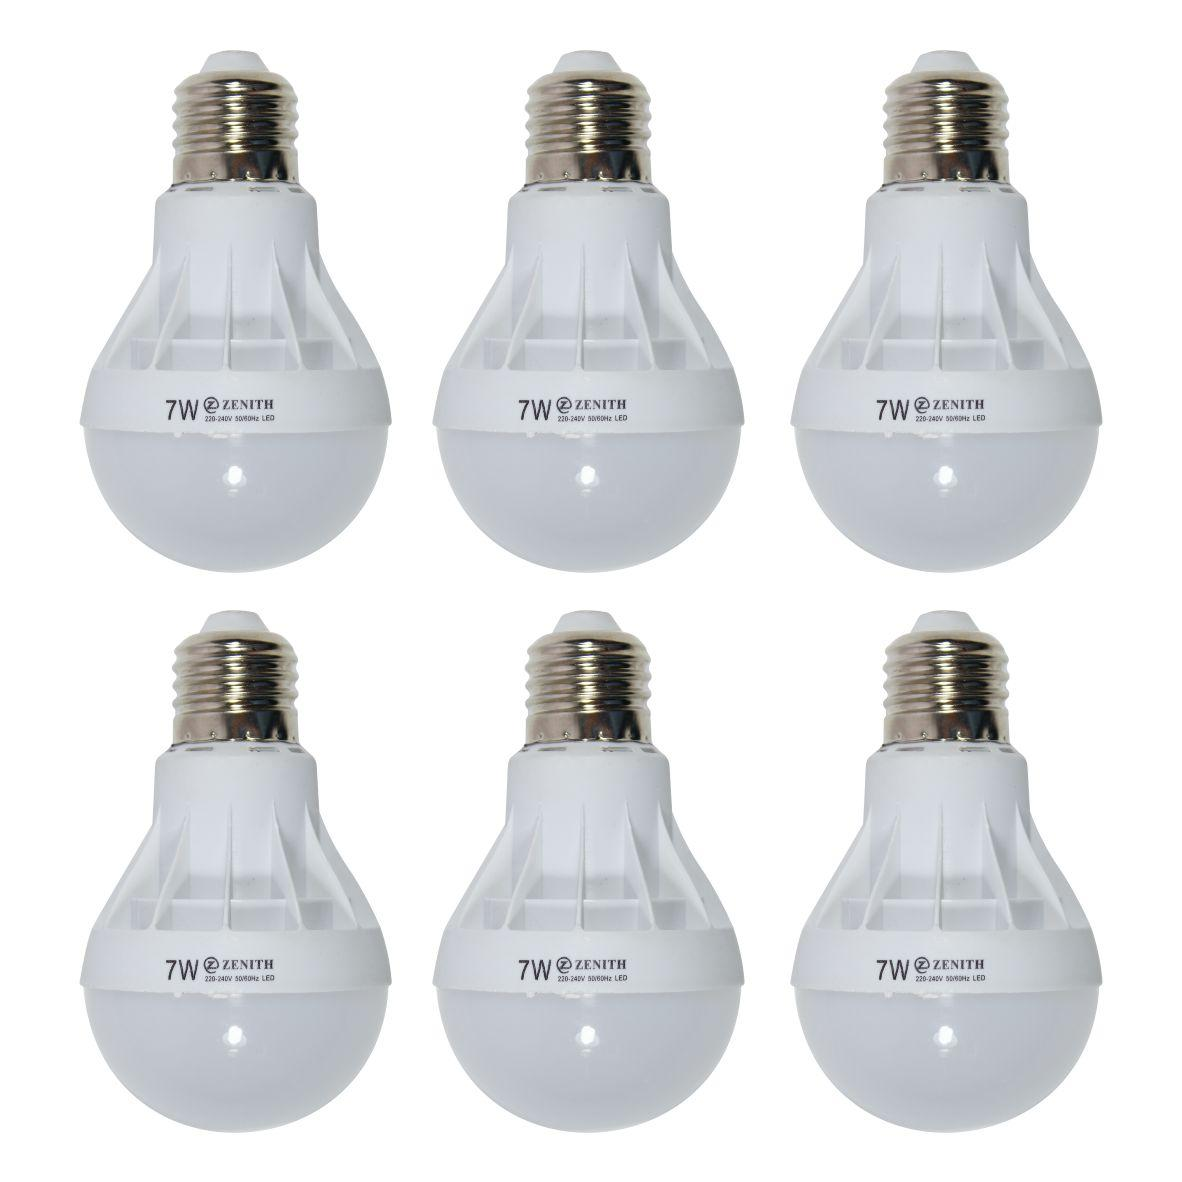 WEITECH LAMPU BOHLAM LED ZENITH HEMAT ENERGI DAN AWET 7 WATT 6 PCS